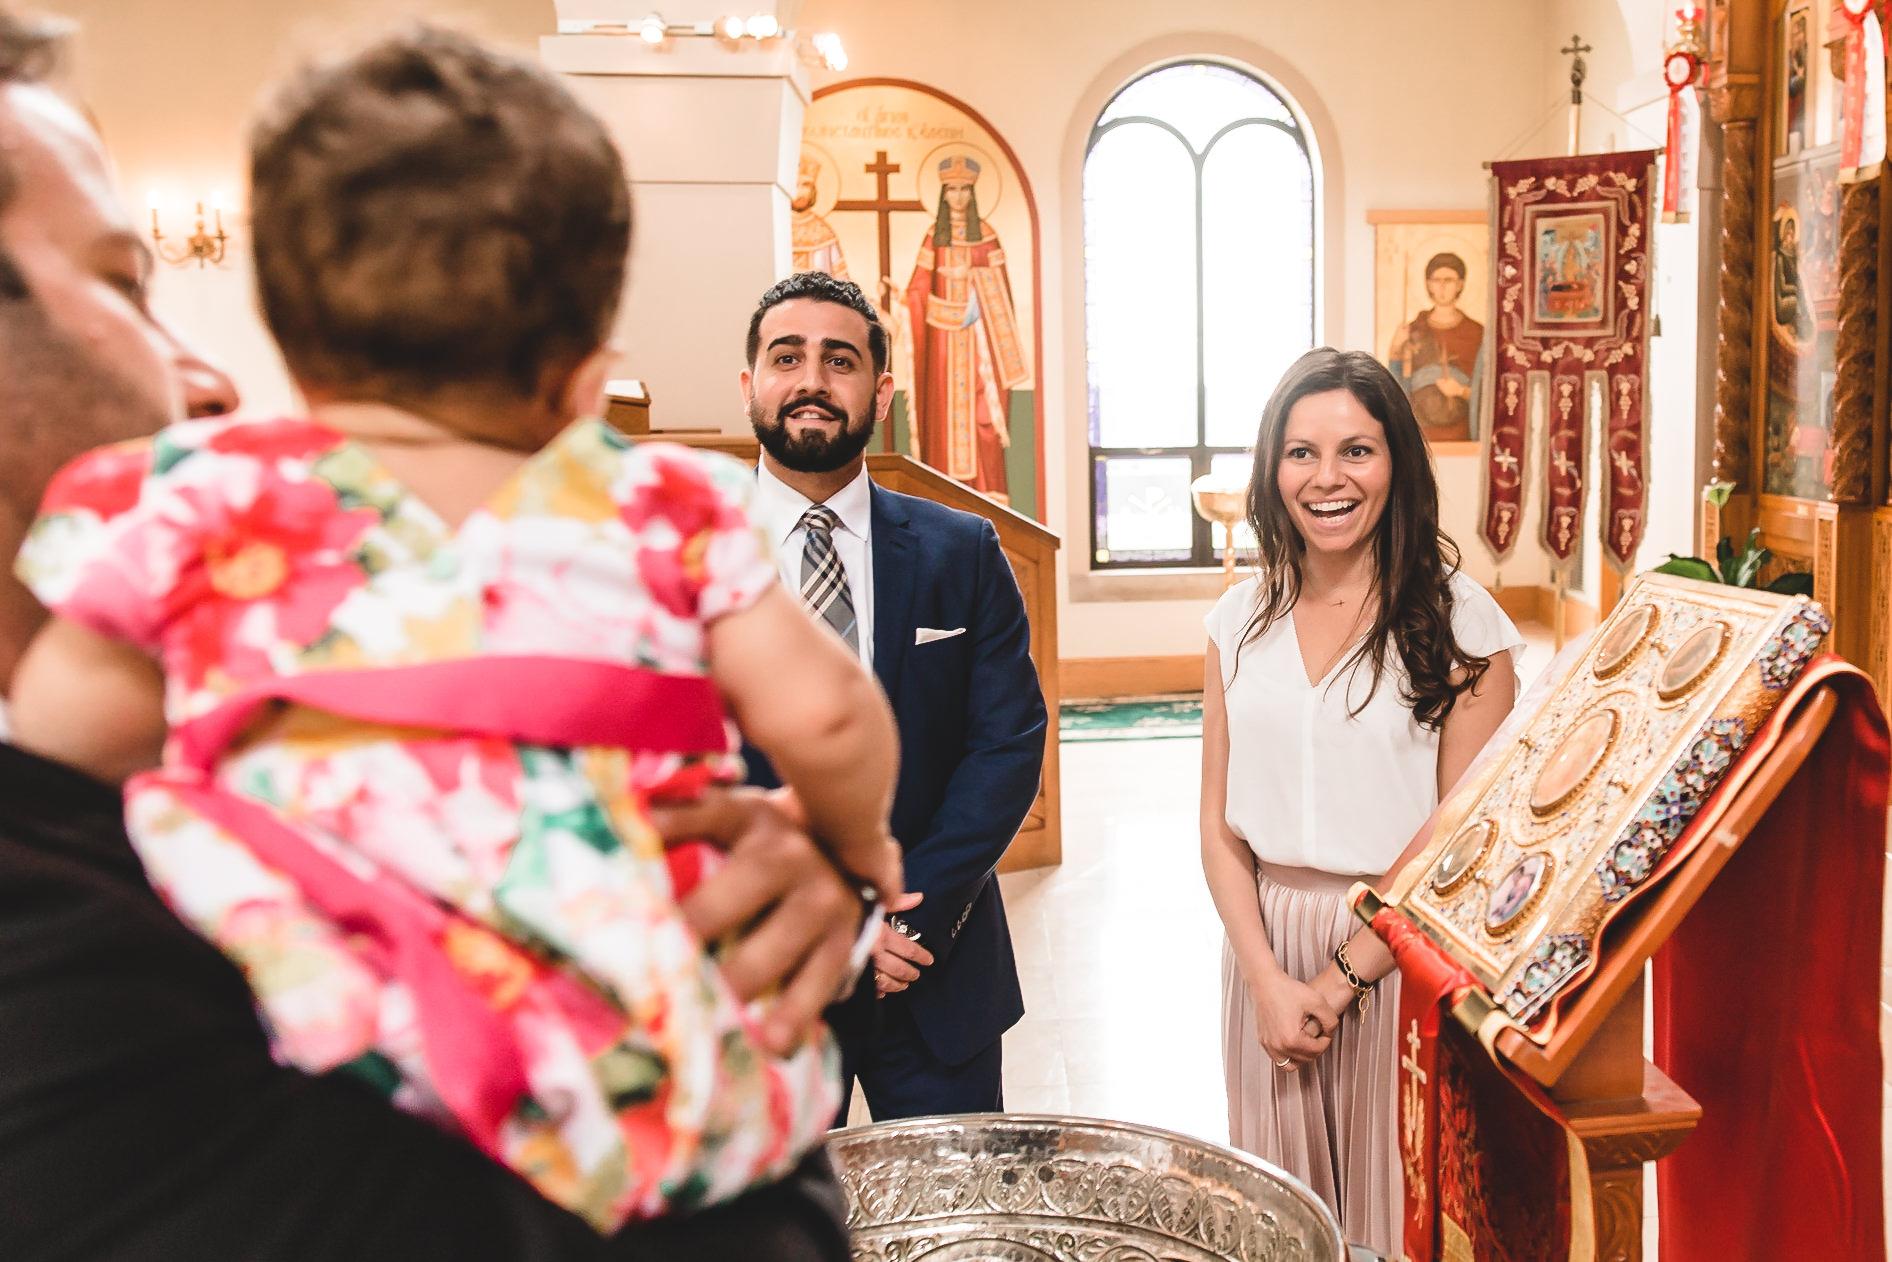 Kimisis Tis Theotokou baptism holmdel nj daniel nydick (6 of 36).jpg